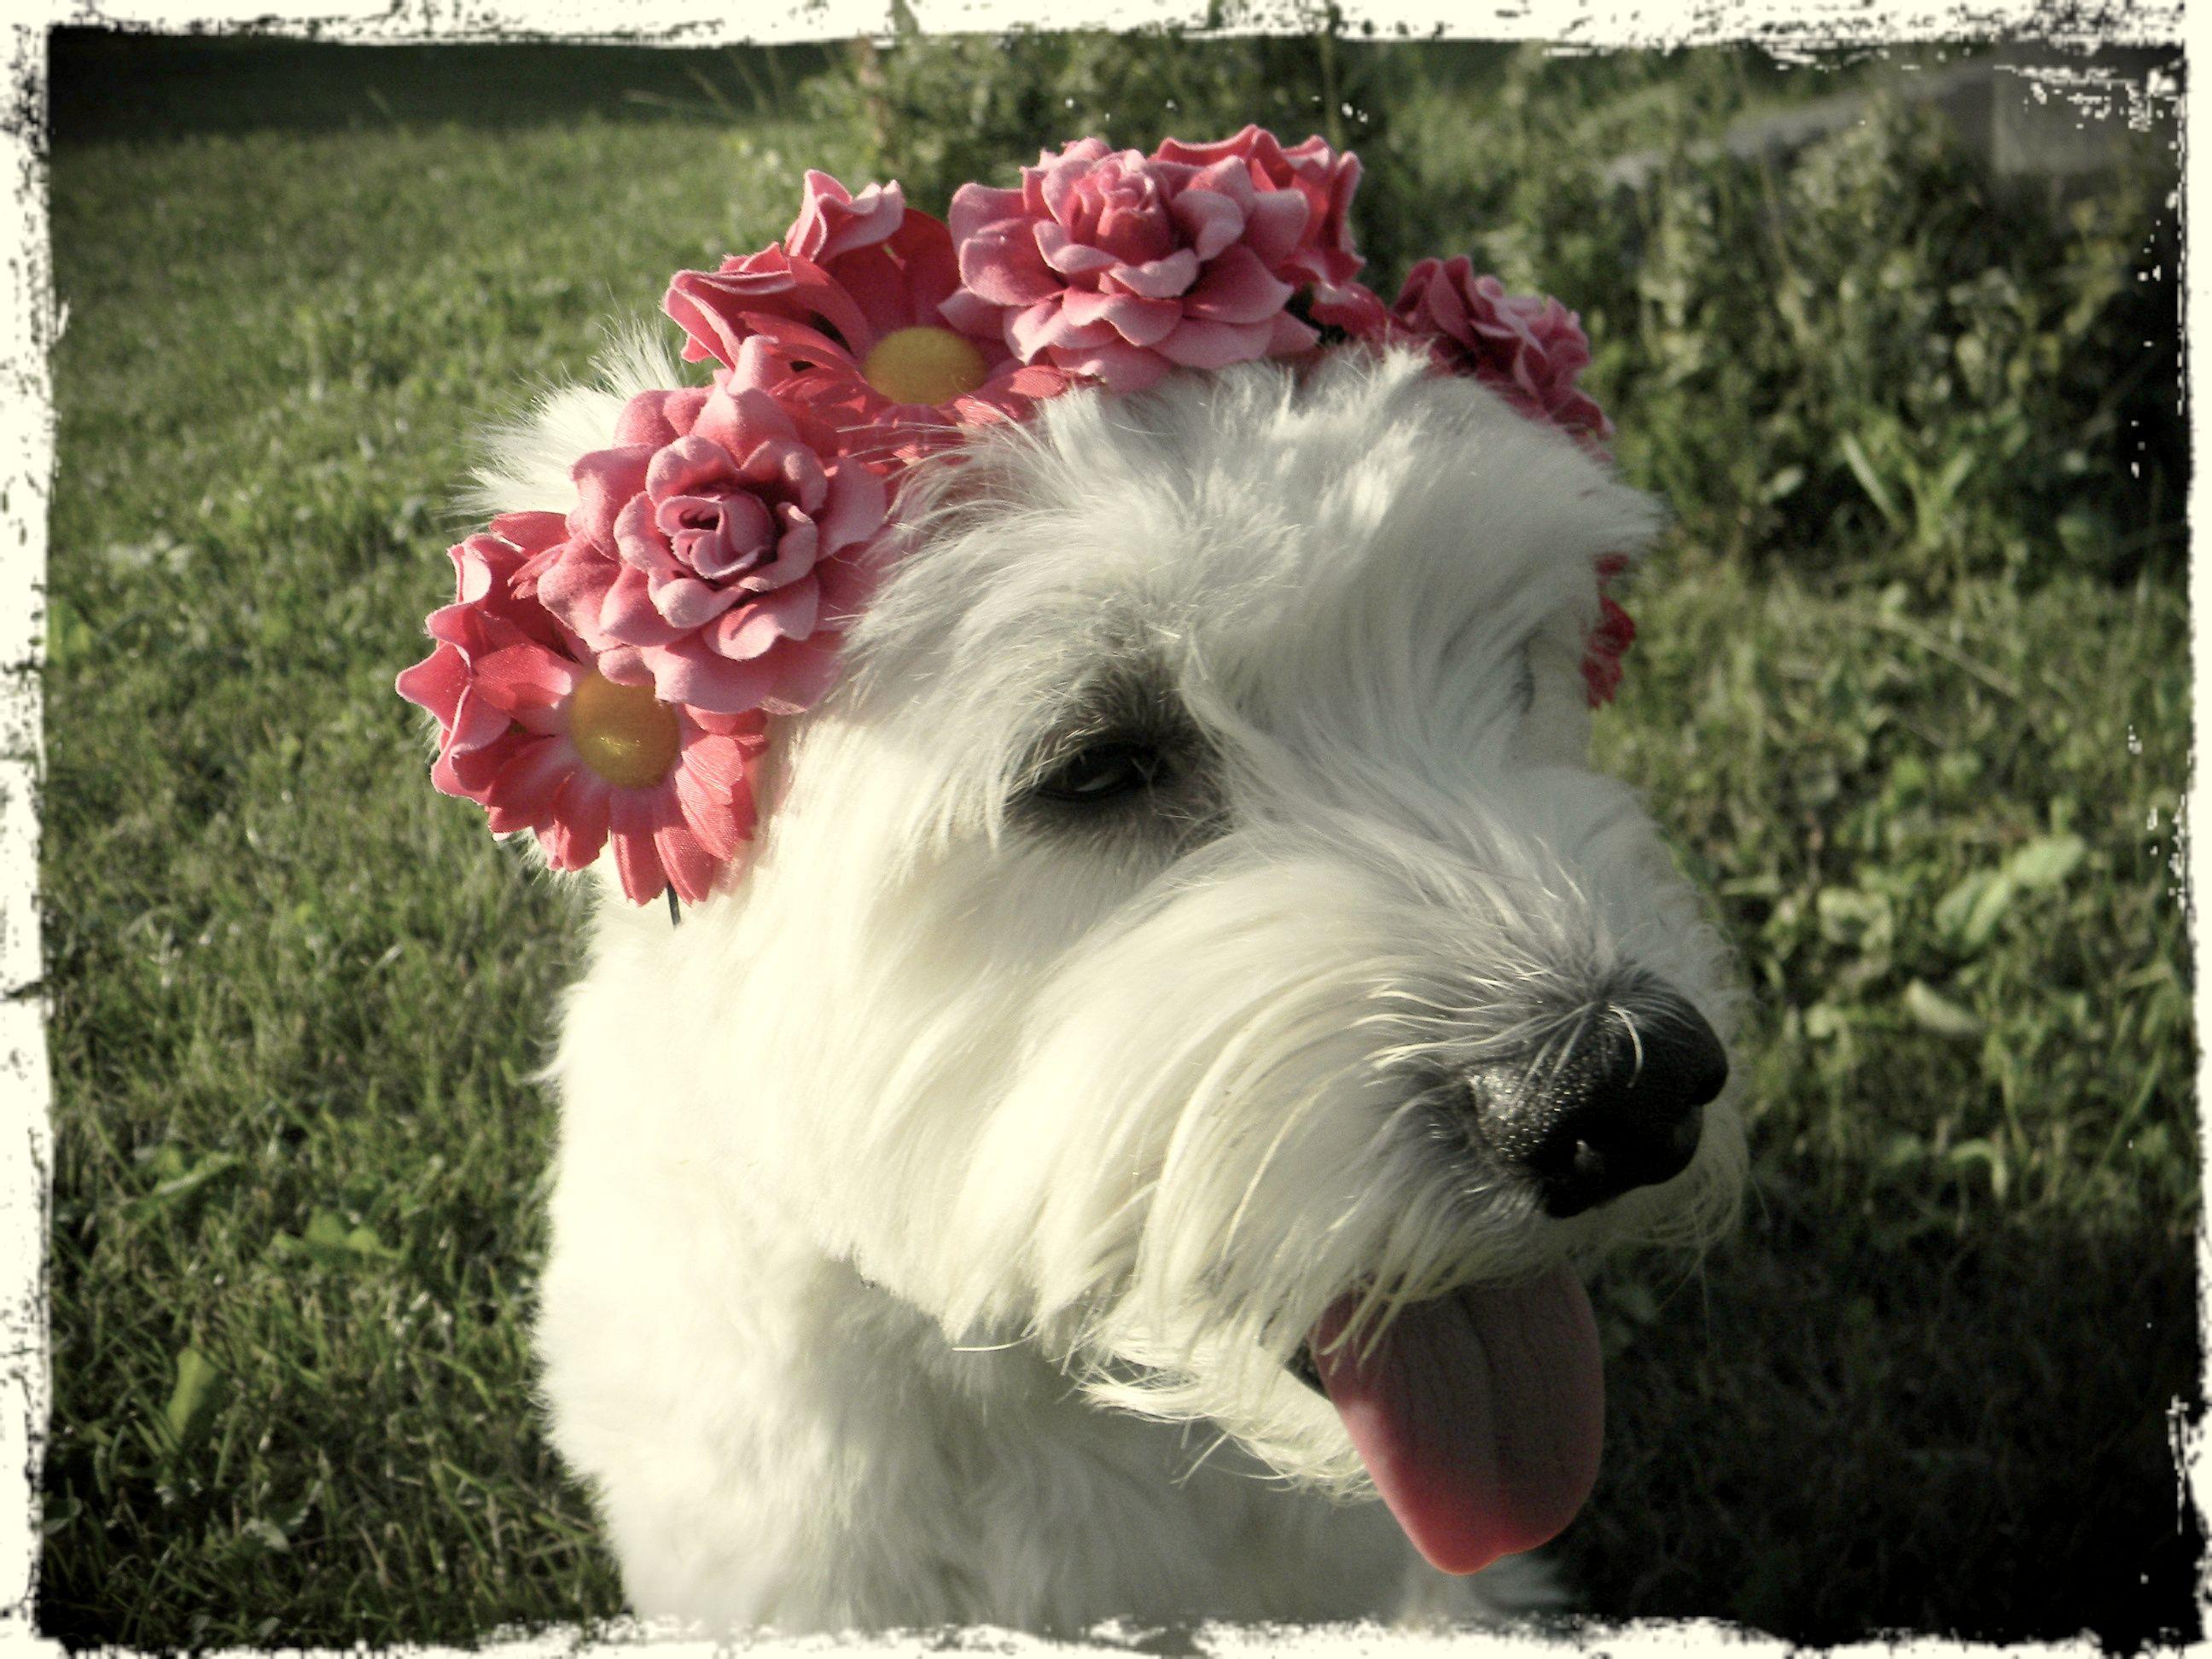 my funny dog, festival styling #floralheadband #pupy #cute #pet